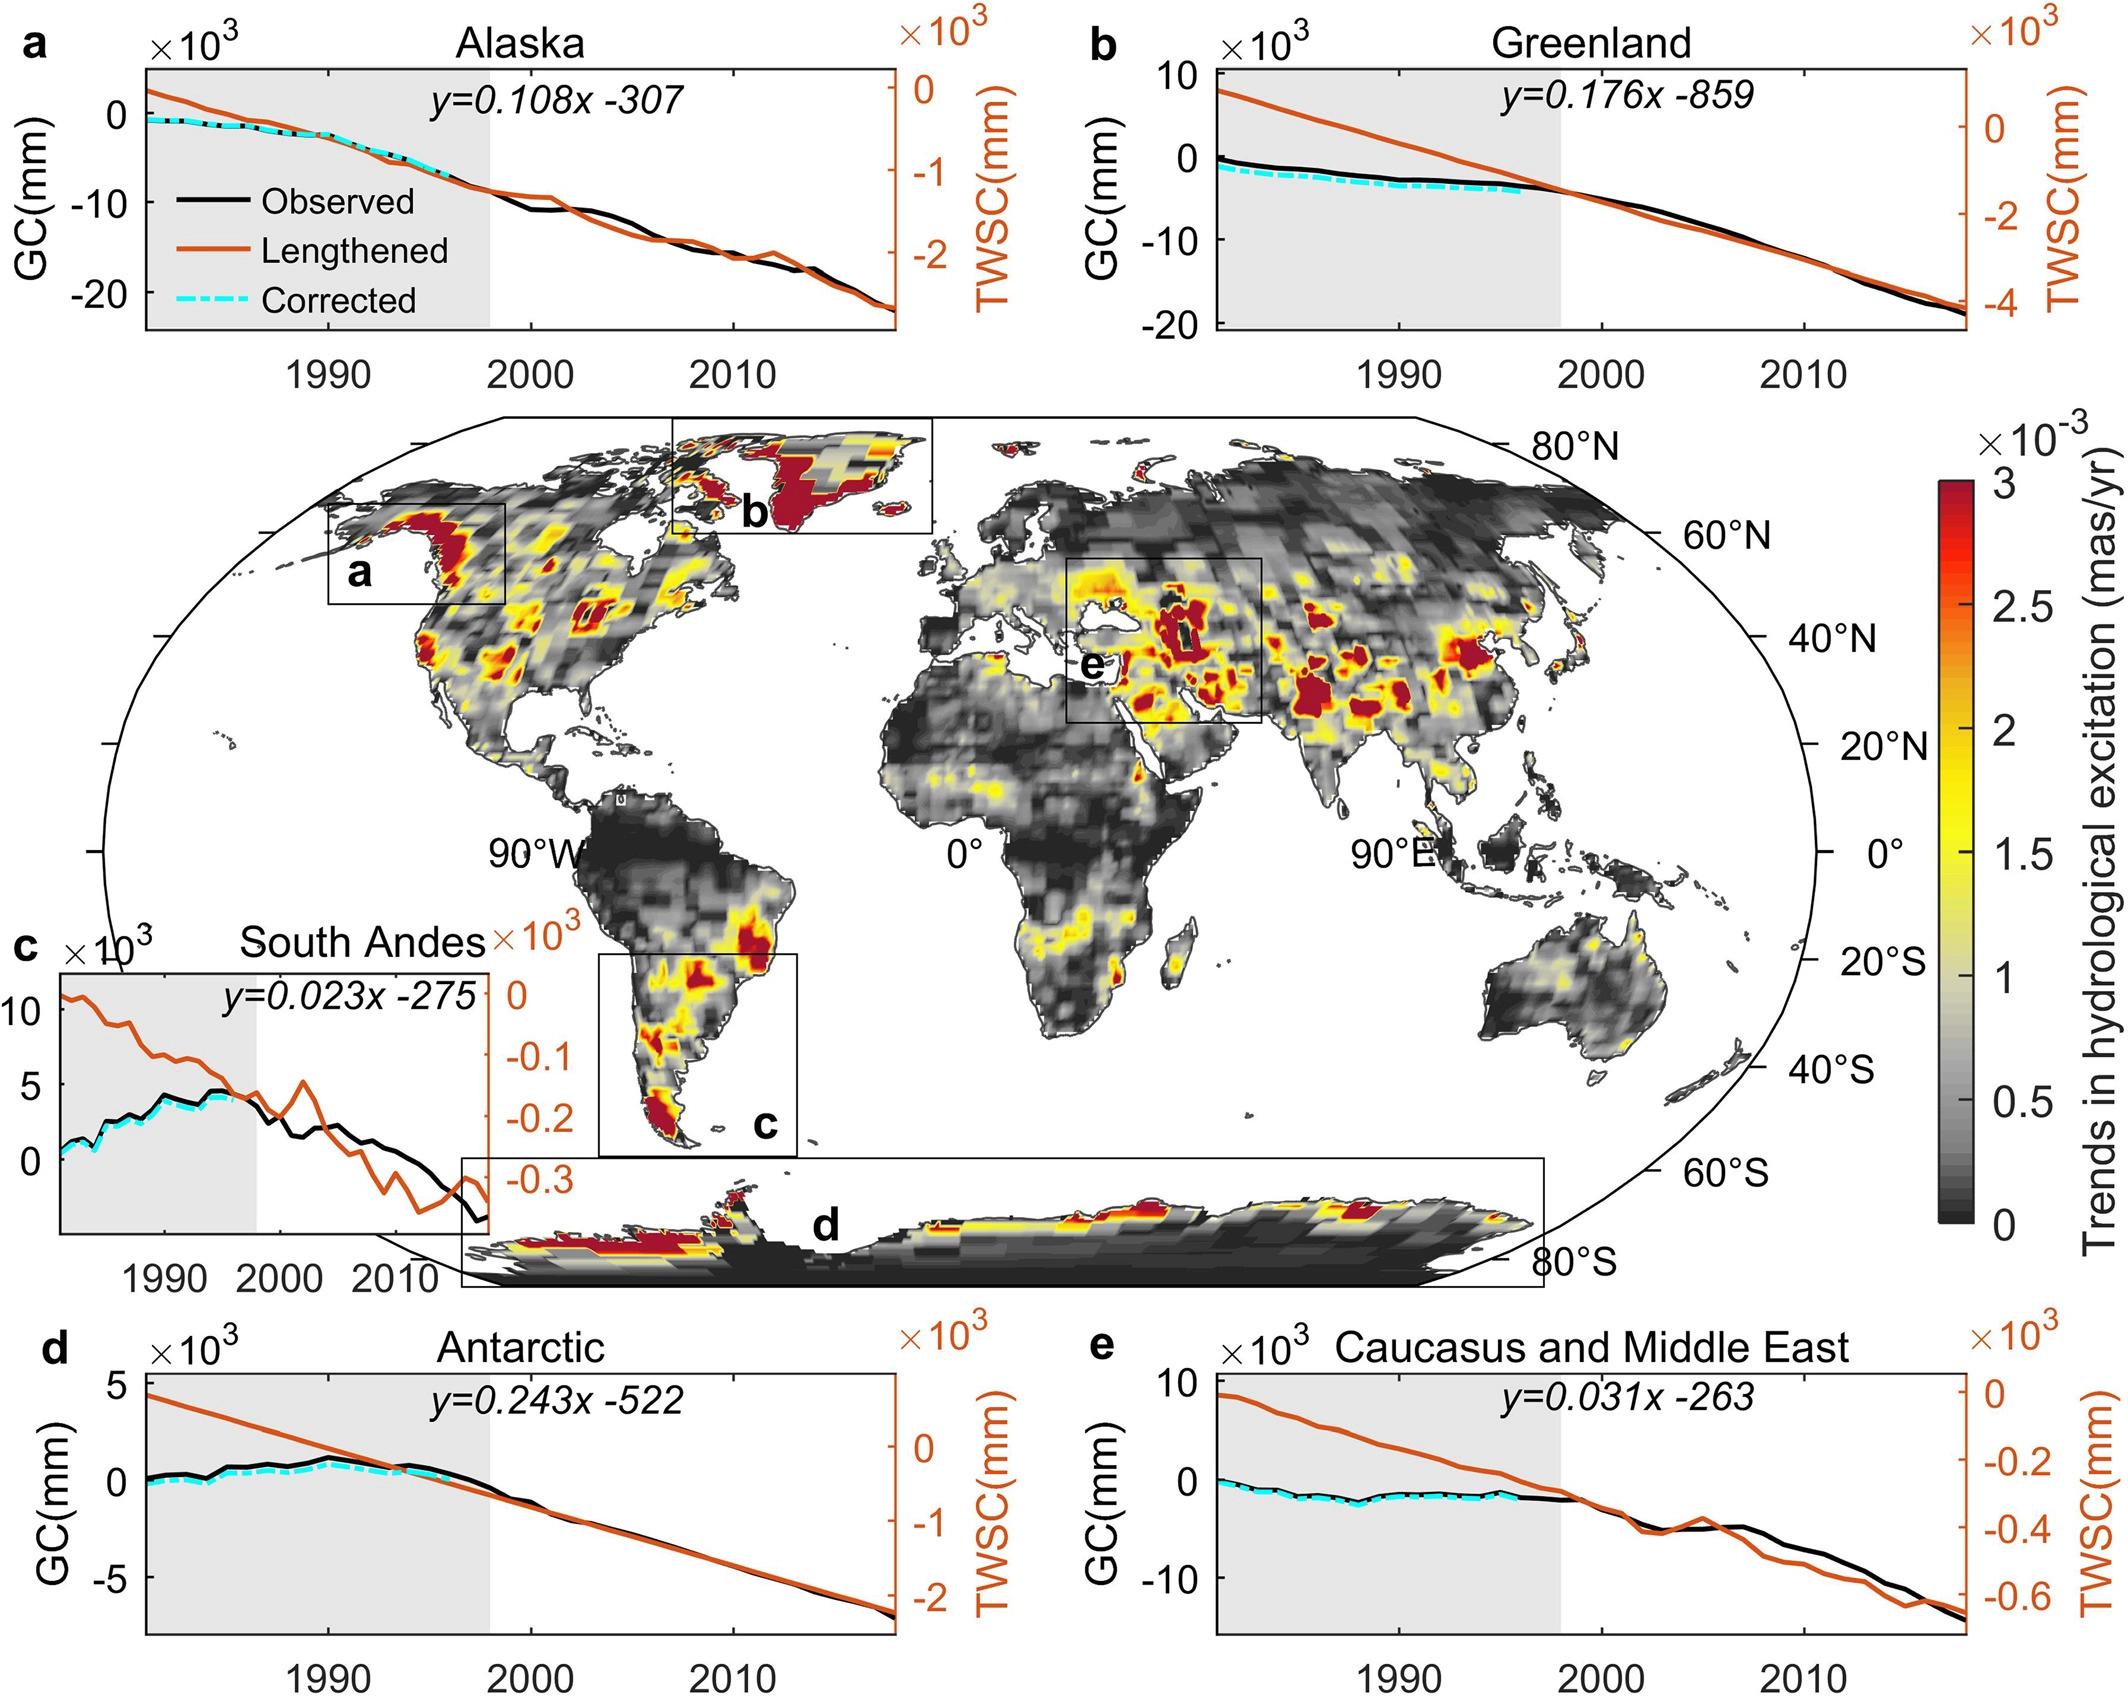 Grafik yang diterbitkan Jurnal Penelitian Geofisika (AGU) memperlihatkan jumlah lapisan es yang terus menurun diberbagai lokasi seperti di Antartika, Andes selatan, Alaska, Greenland dari tahun 1990-2010. (dok. Jurnal AGU)